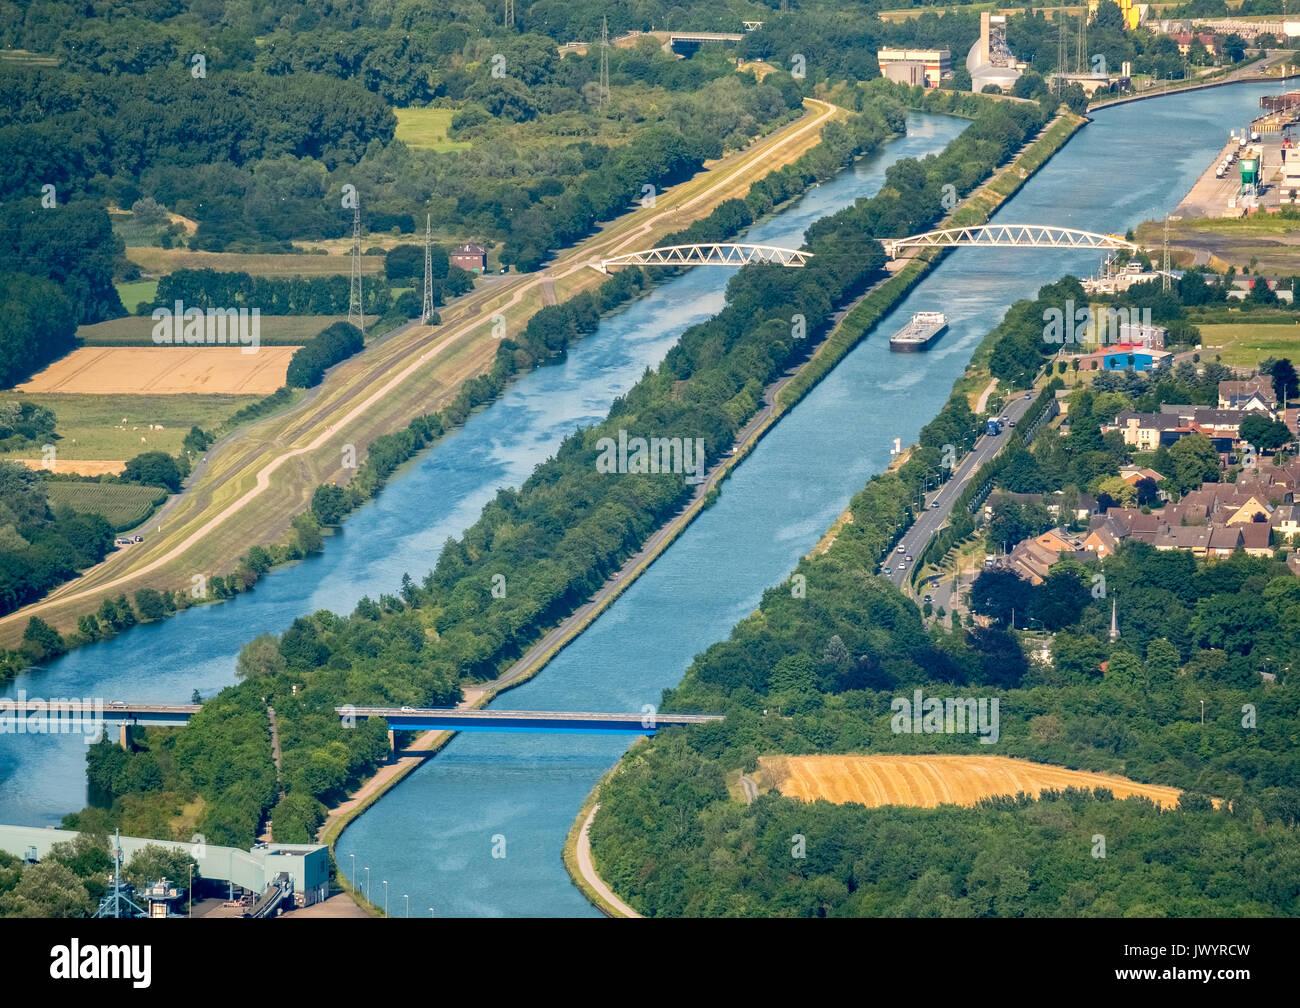 Datteln-Hamm canal, river Lippe, inland waterways, lippe bridges over the lippe, bridges lippe parks, lippe side channel, Hamm, Ruhr, Nordrhein-Westfa - Stock Image